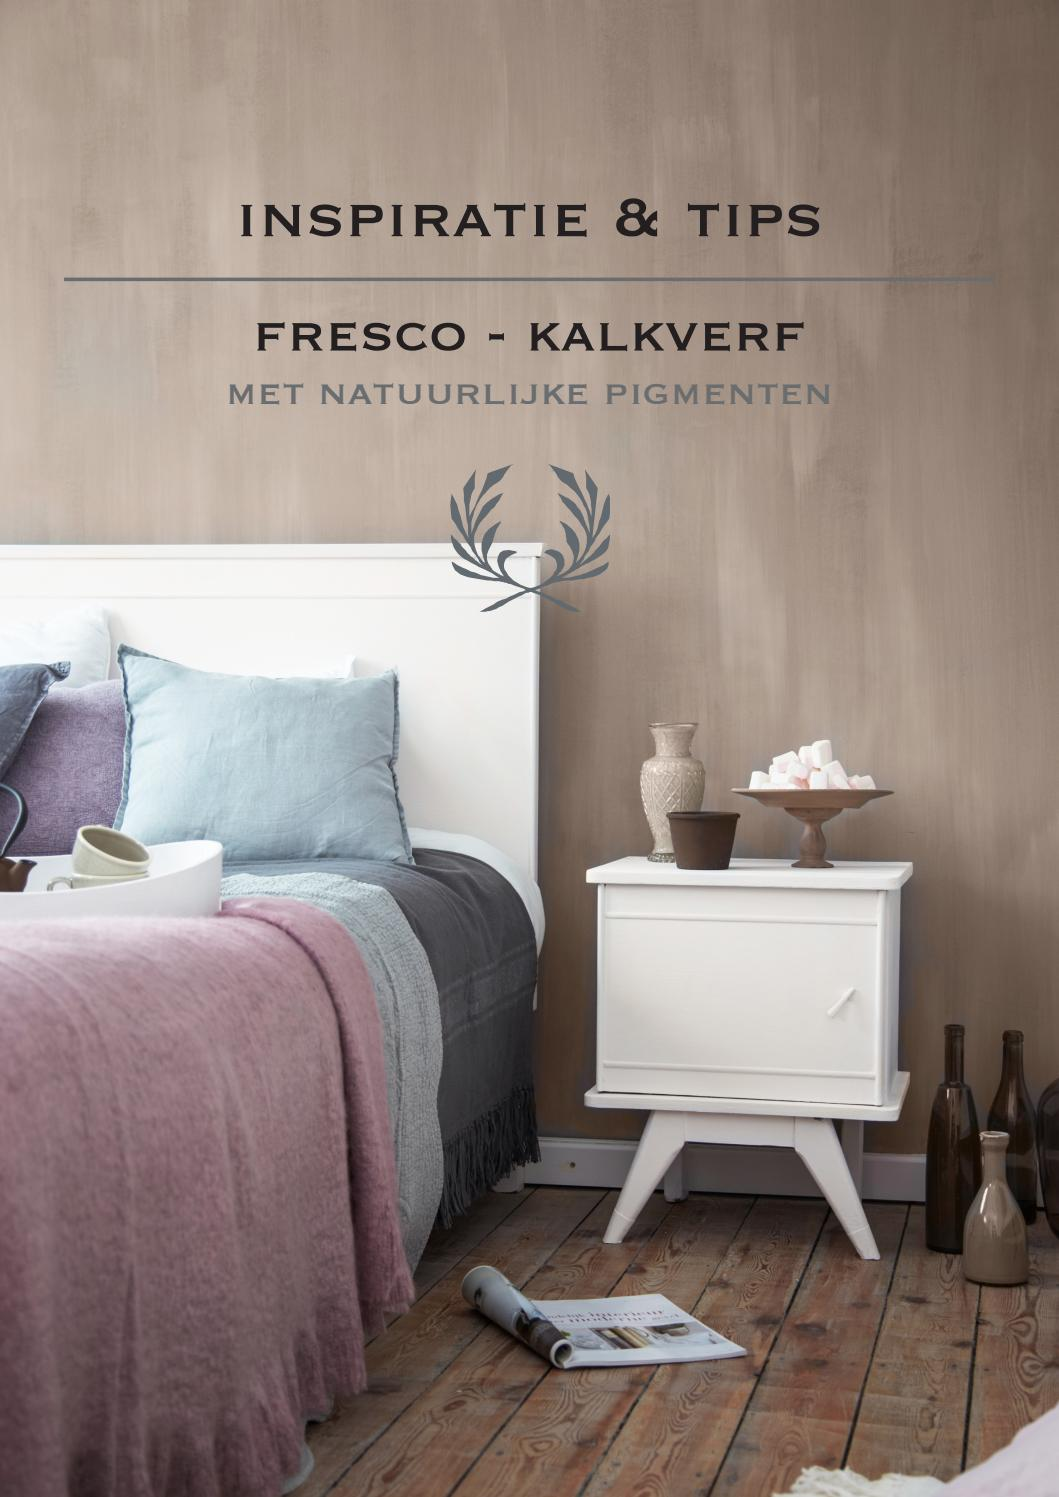 Fresco kalkverf inspiratie  tips by Pure  Original  Issuu